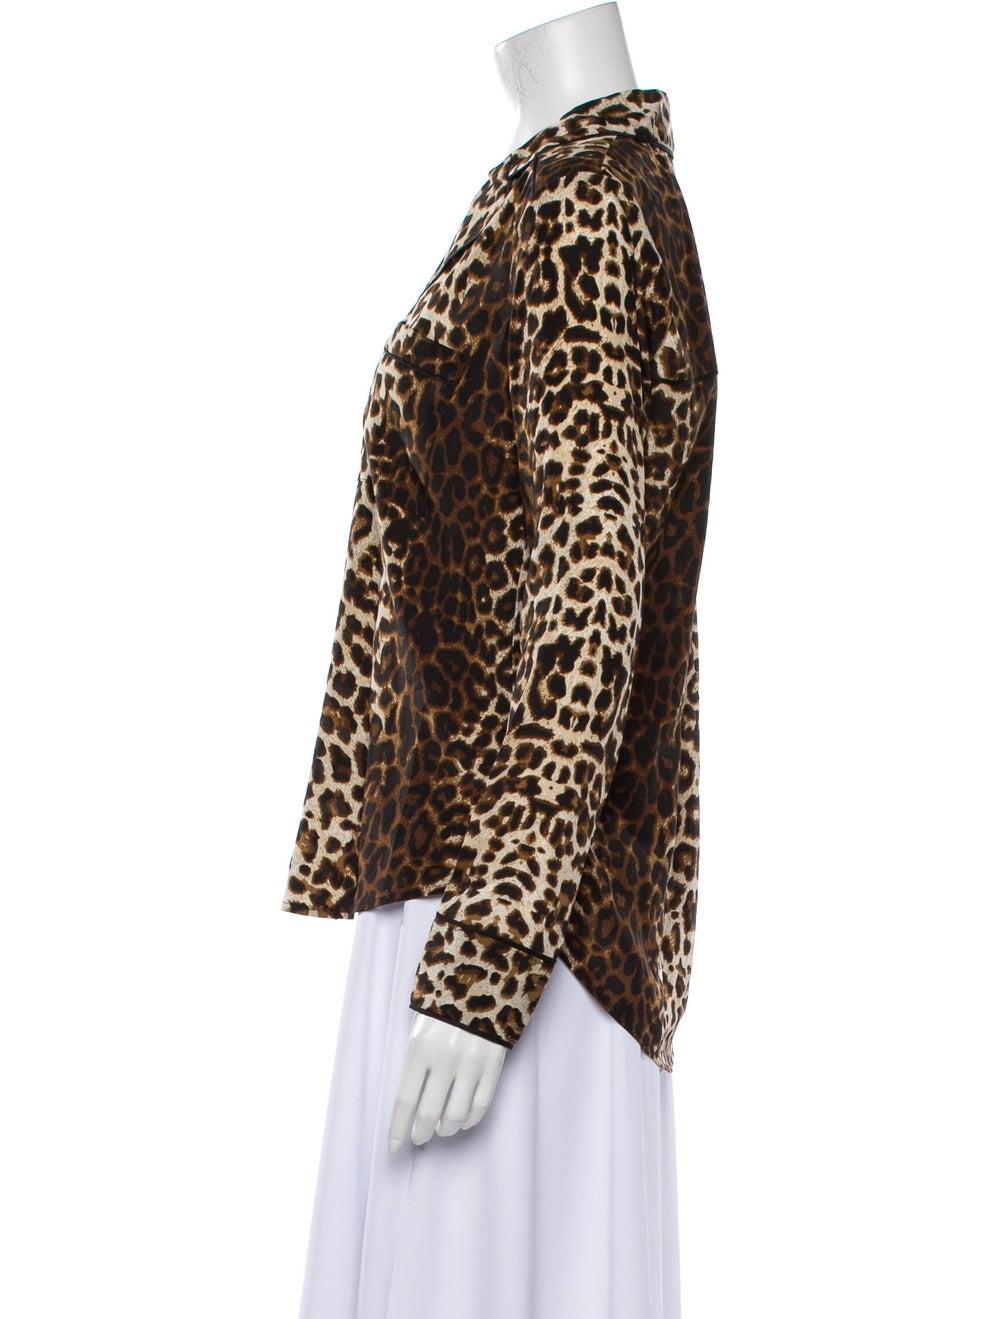 Veronica Beard Silk Animal Print Top Brown - image 2